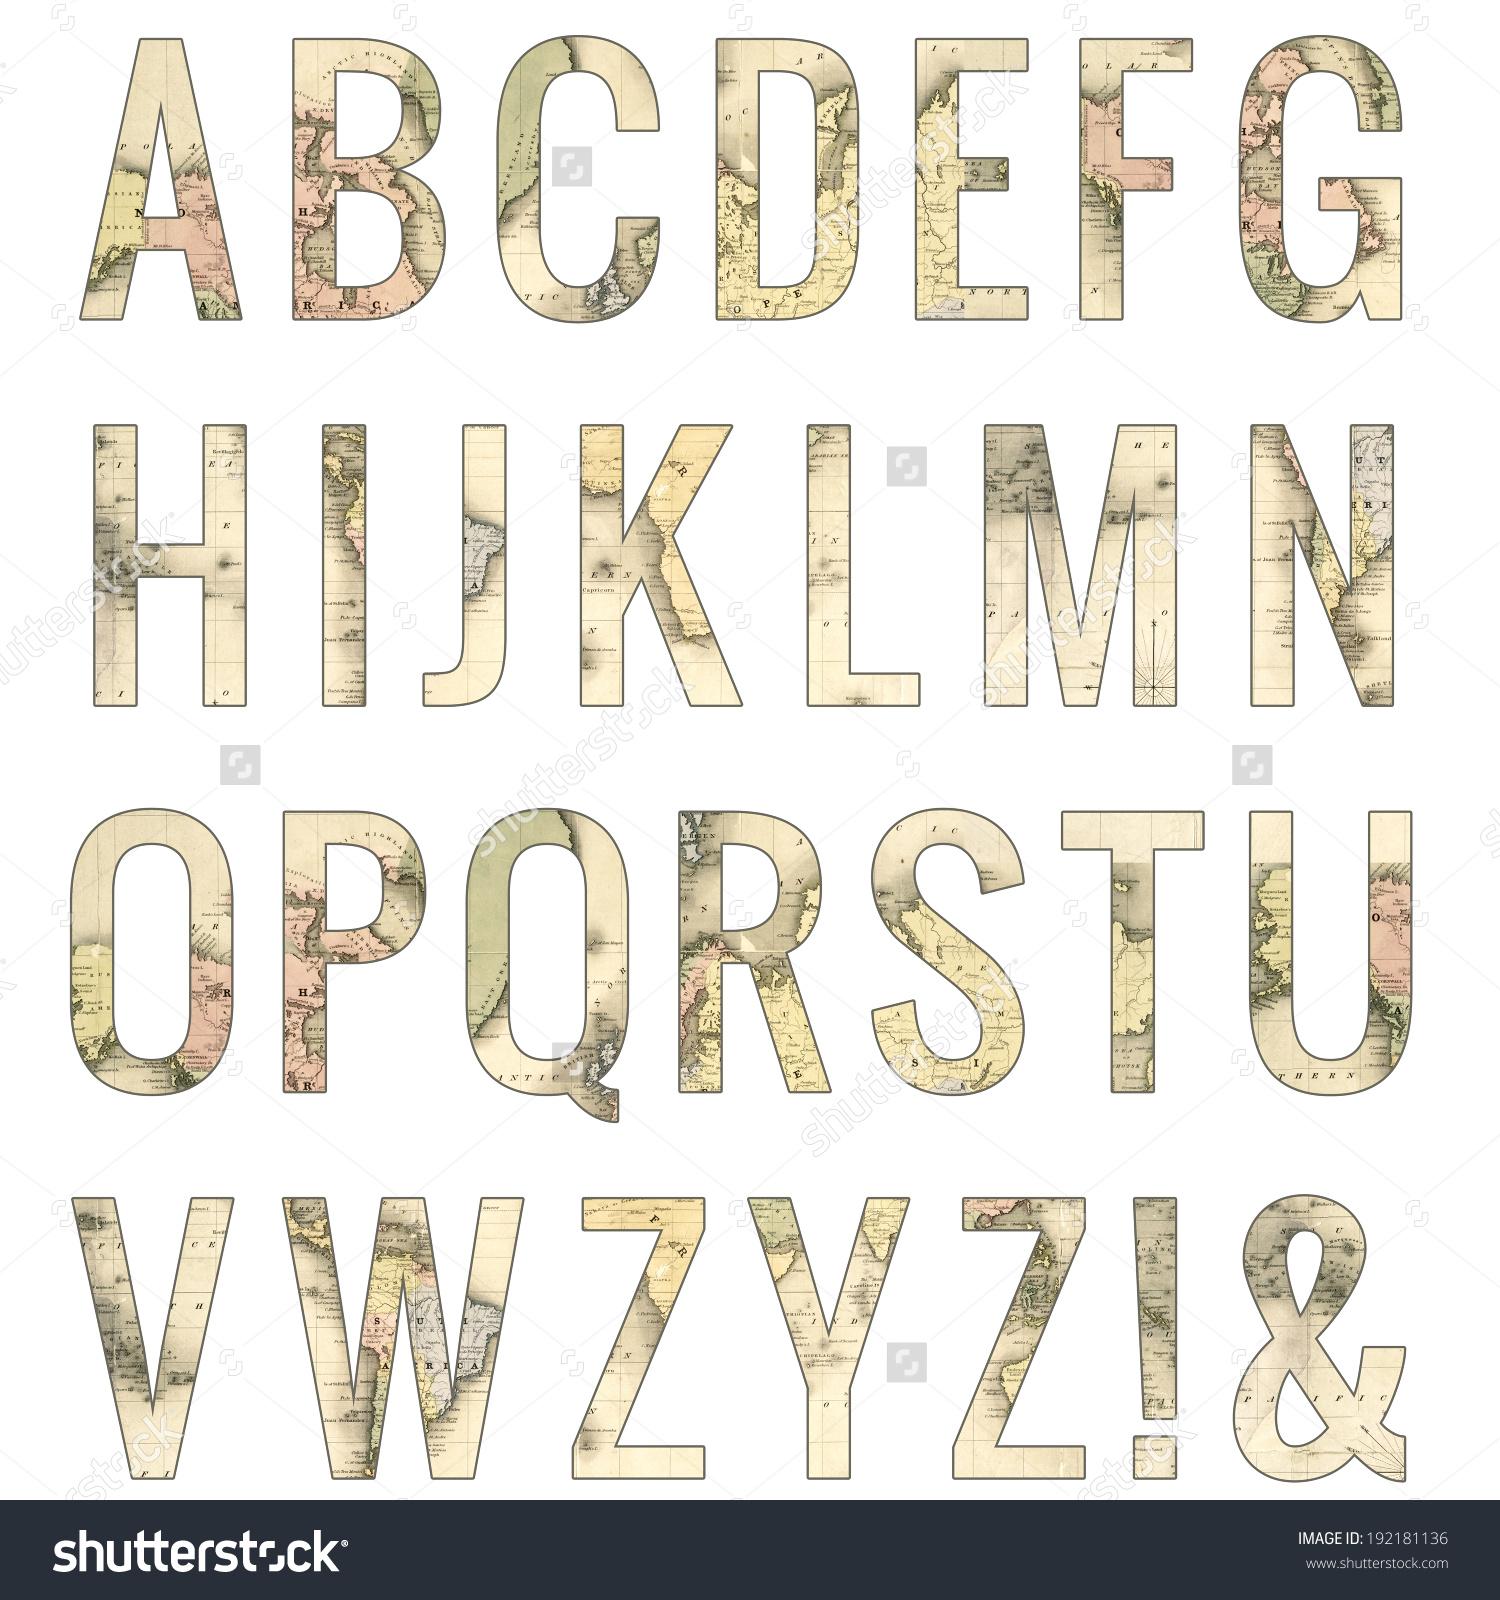 Clipart alphabet letter travel png freeuse stock Vintage Map Alphabet Vintage Map Letters Stock Illustration ... png freeuse stock